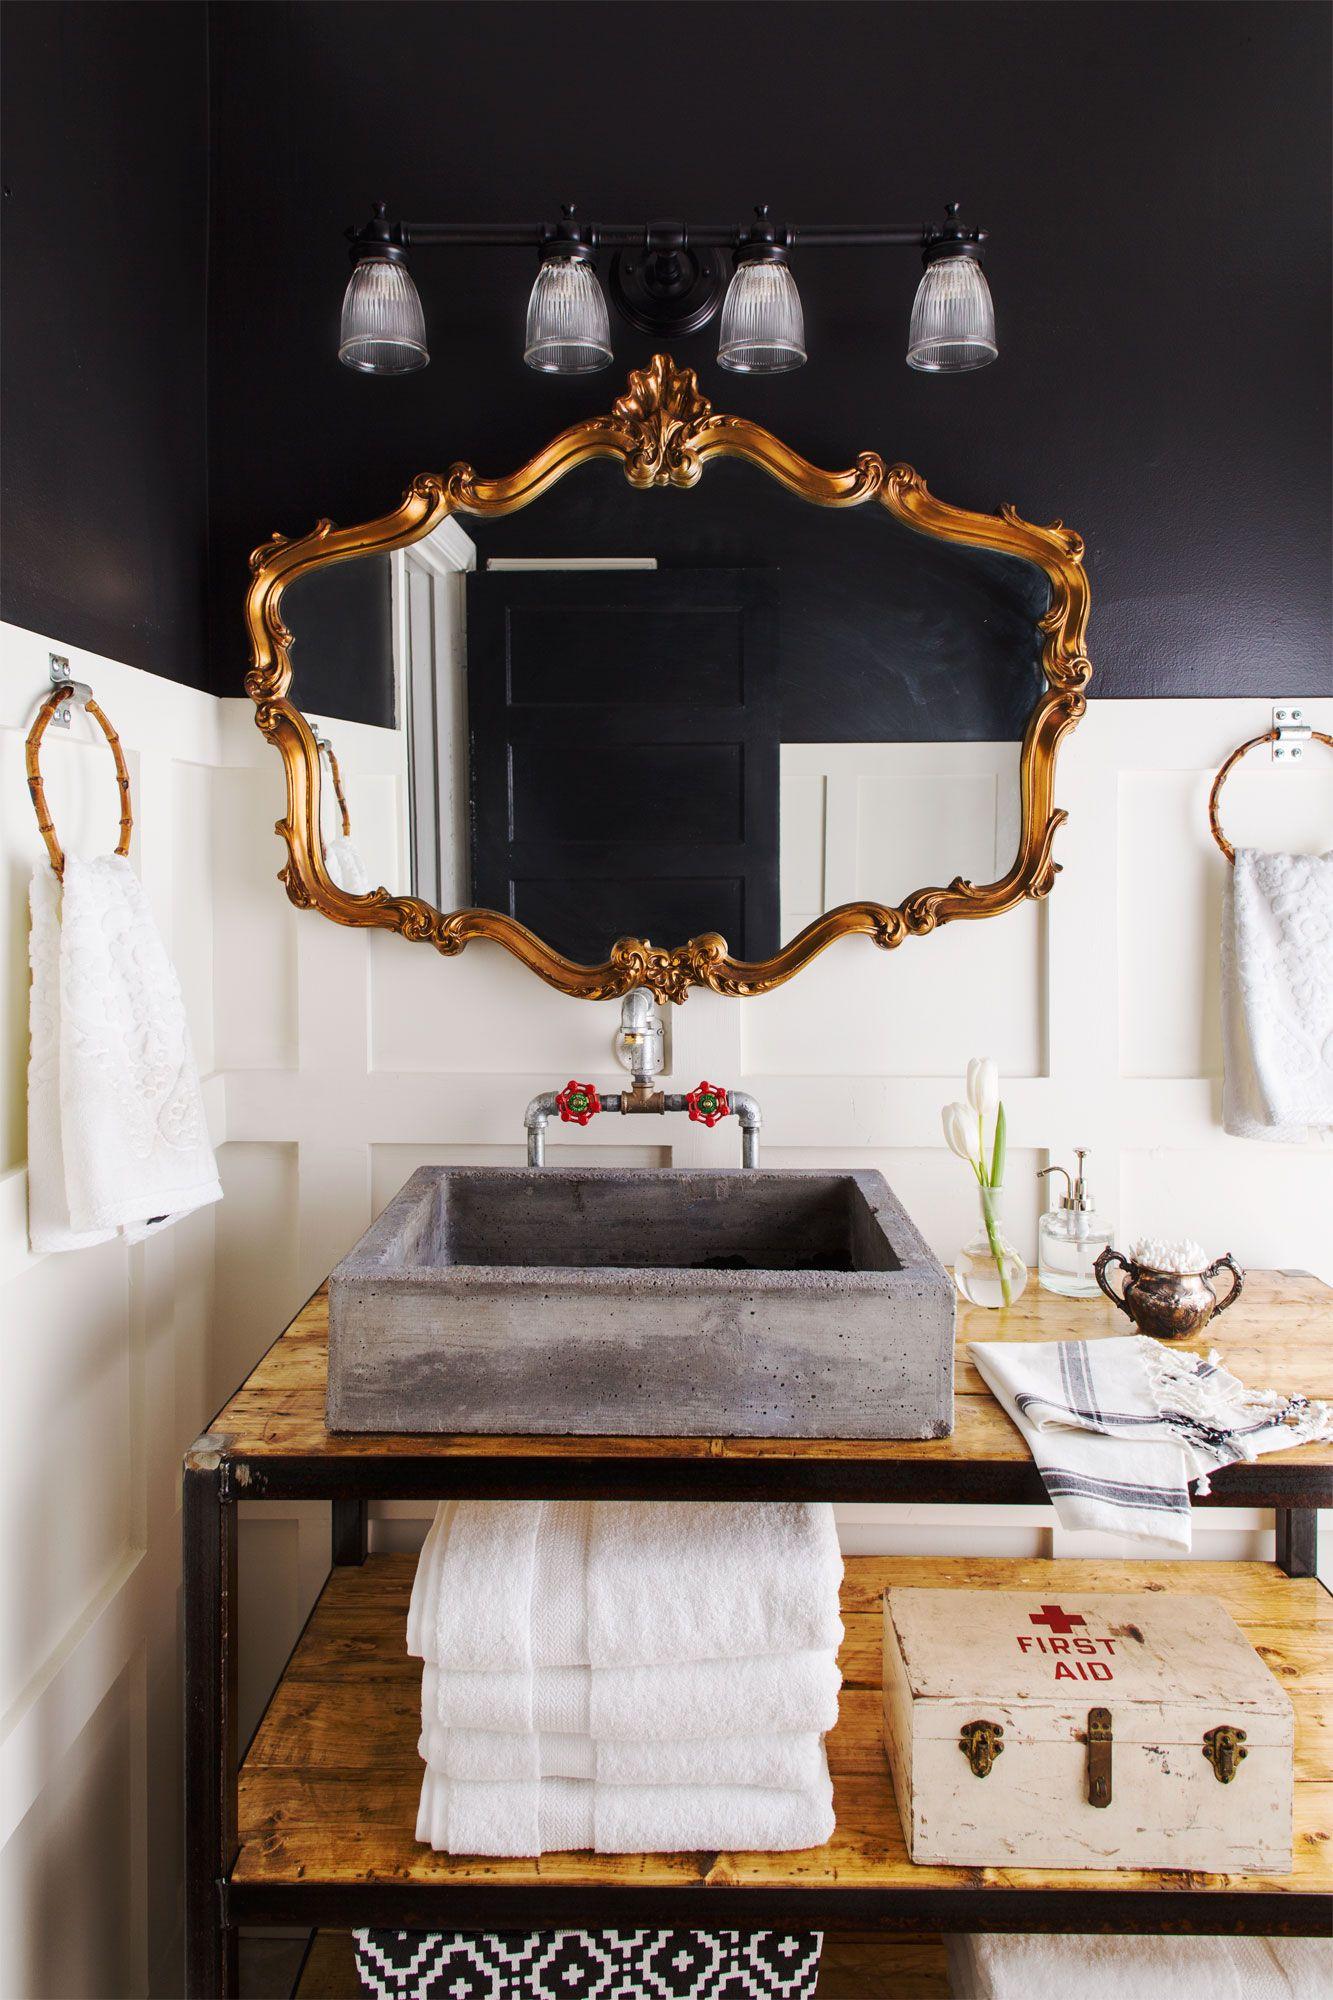 Trinityu0027s husband Jason made the vanity with